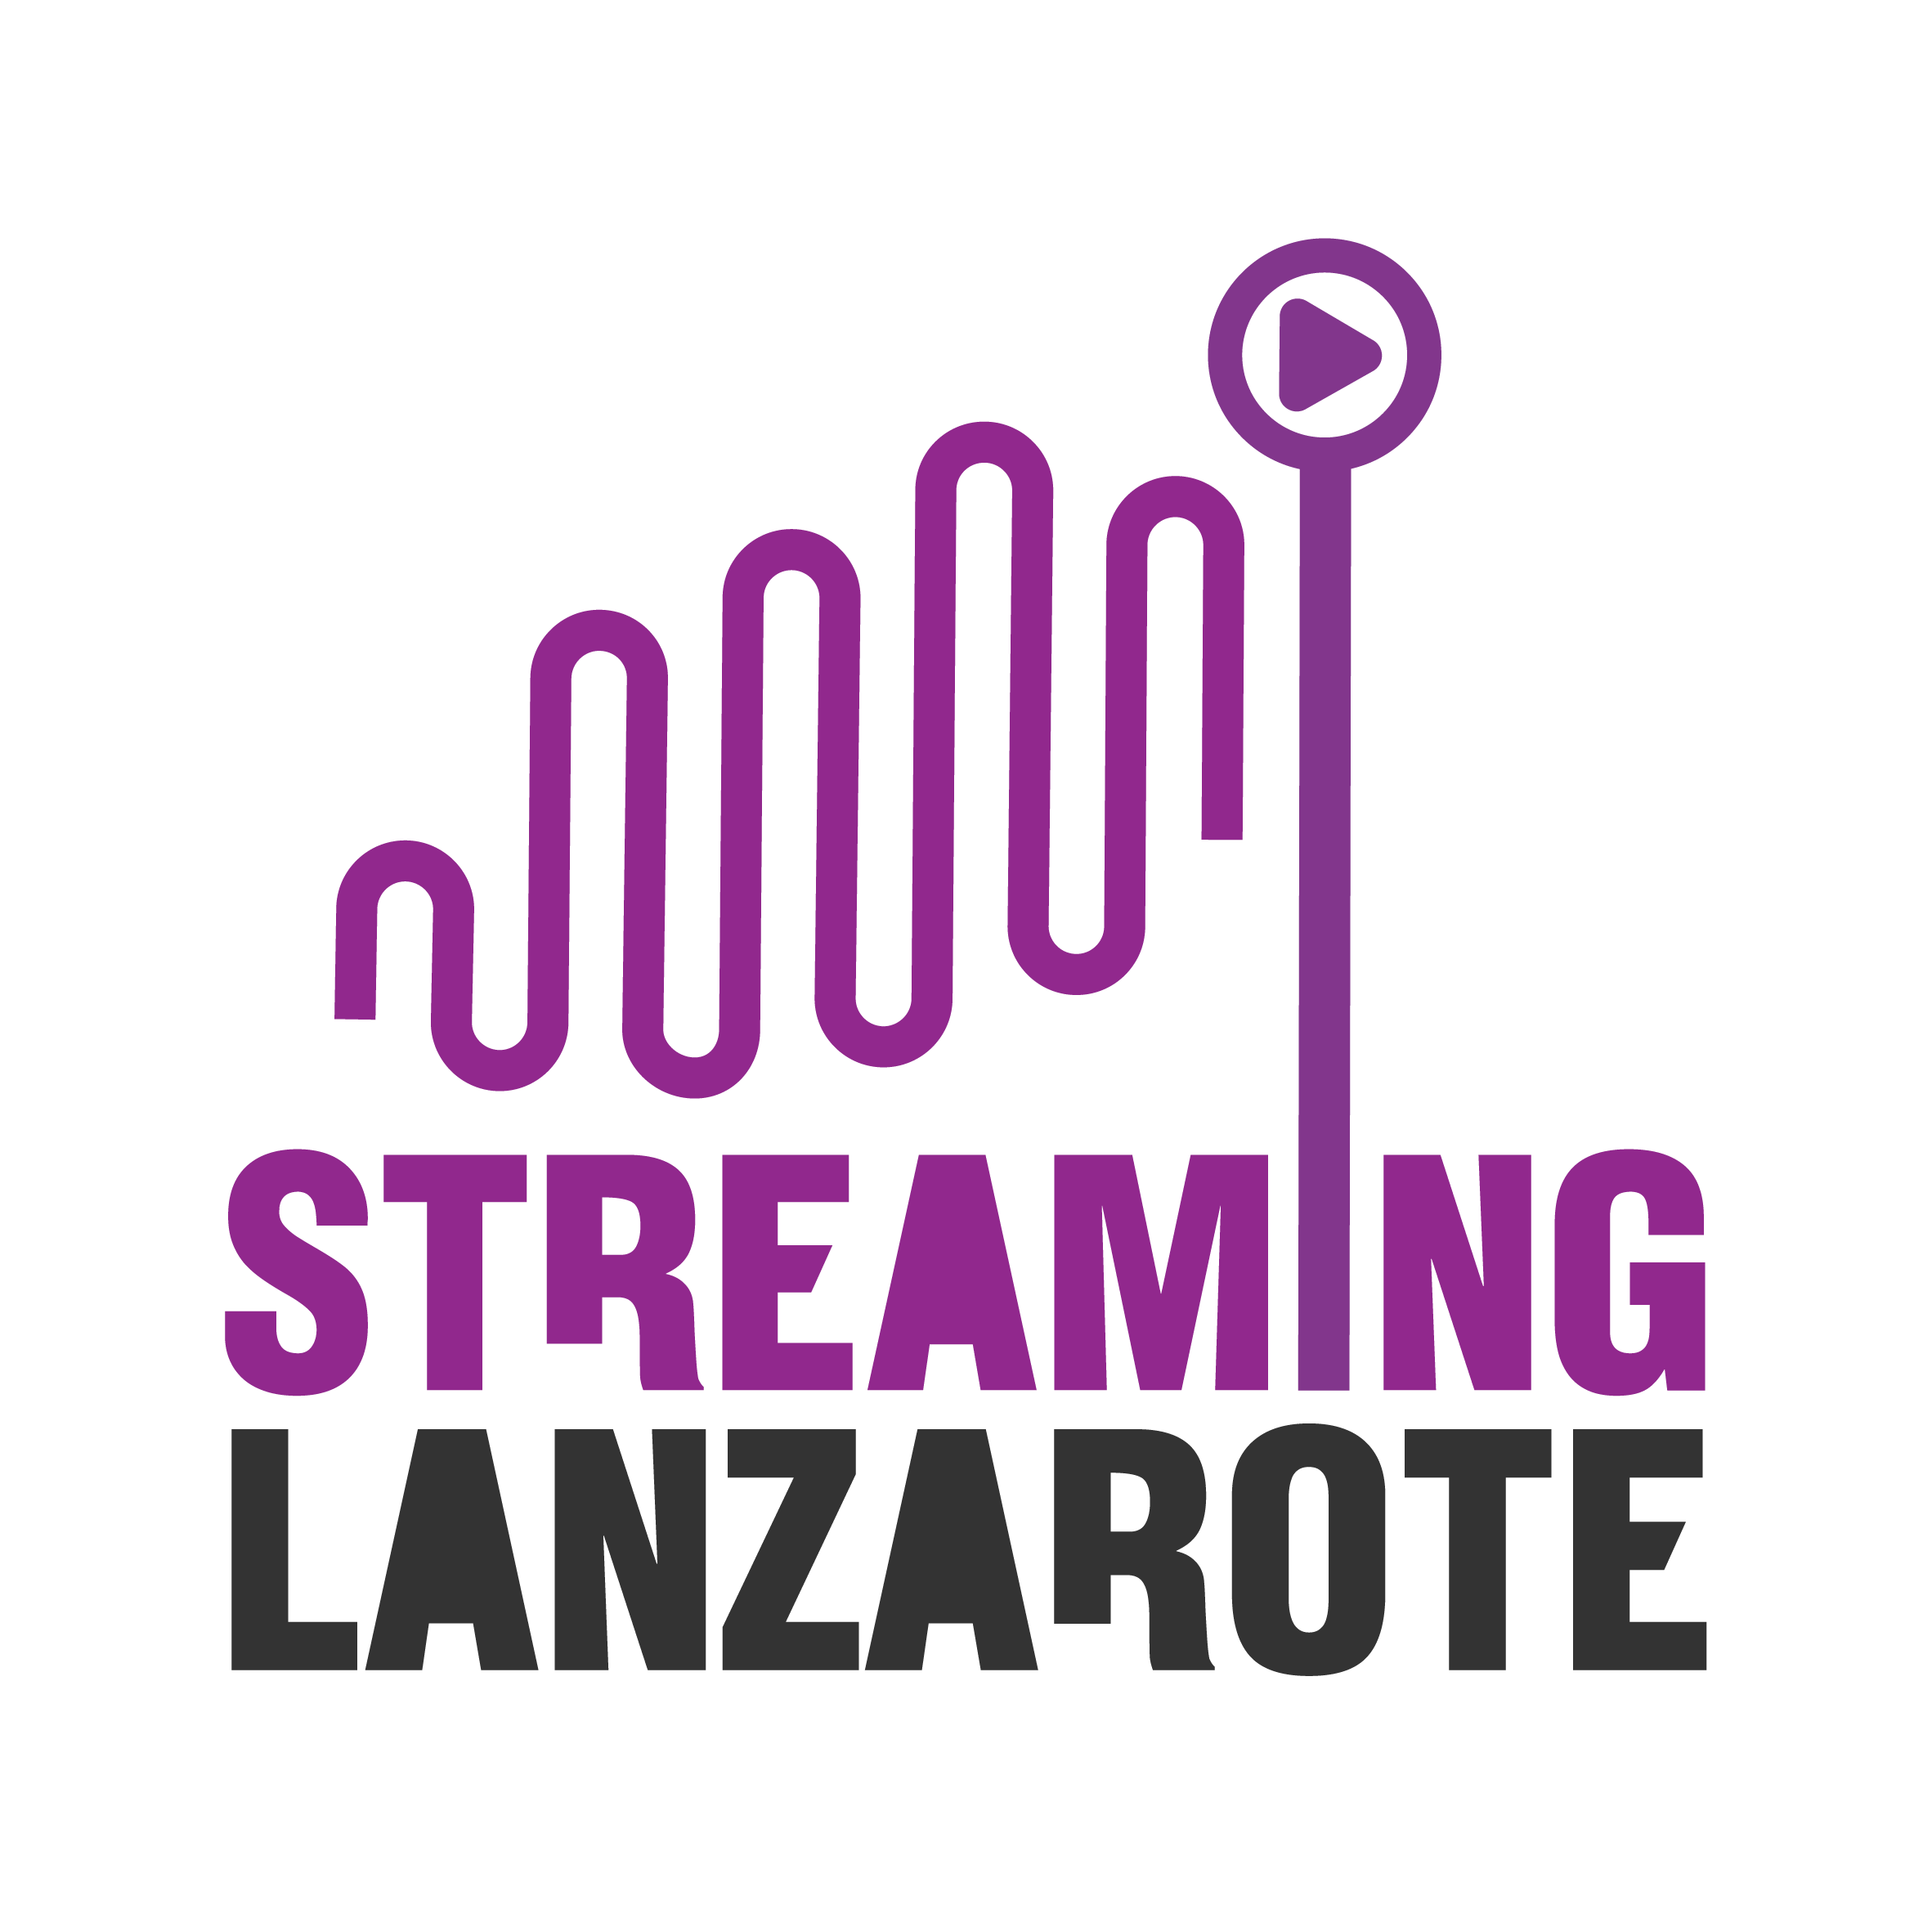 Streaming Lanzarote